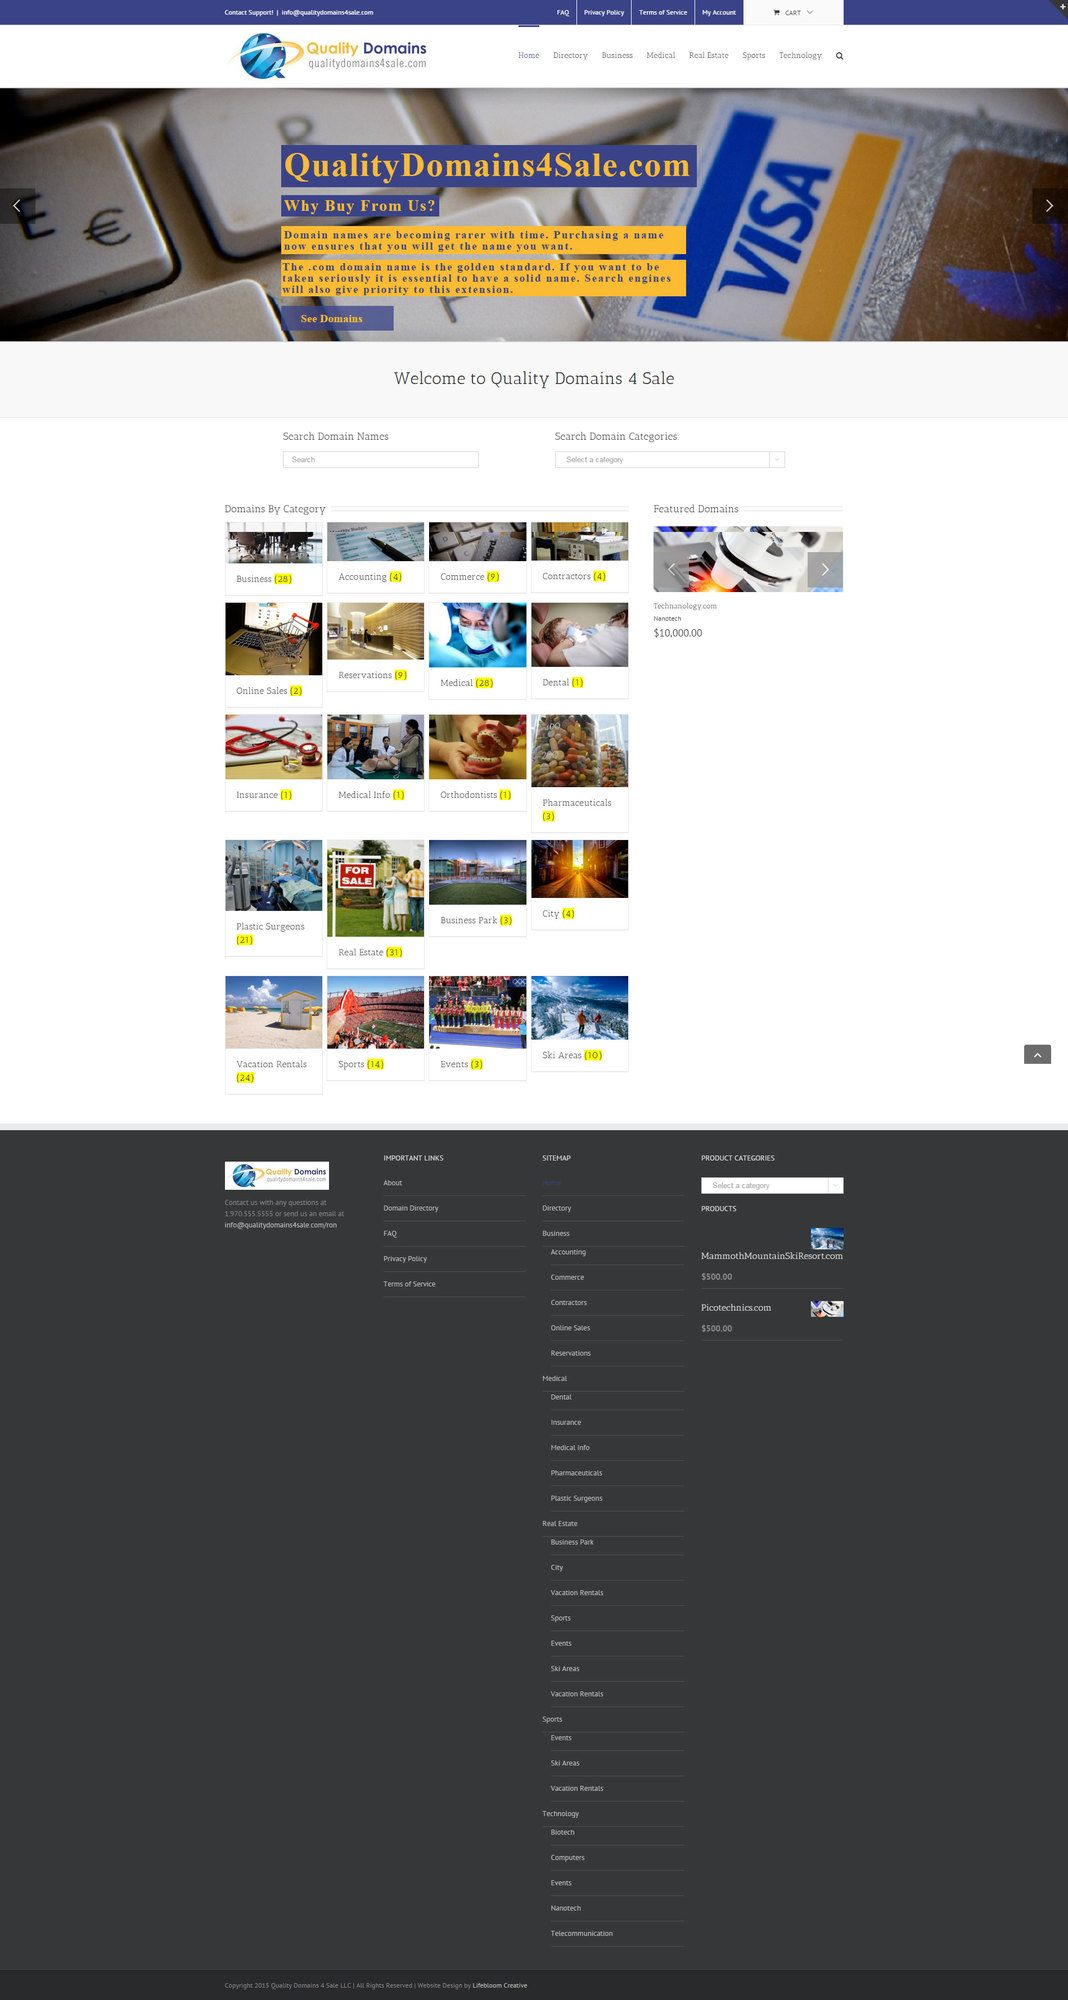 QualityDomaisn4Sale.com-eCommerce-website-design